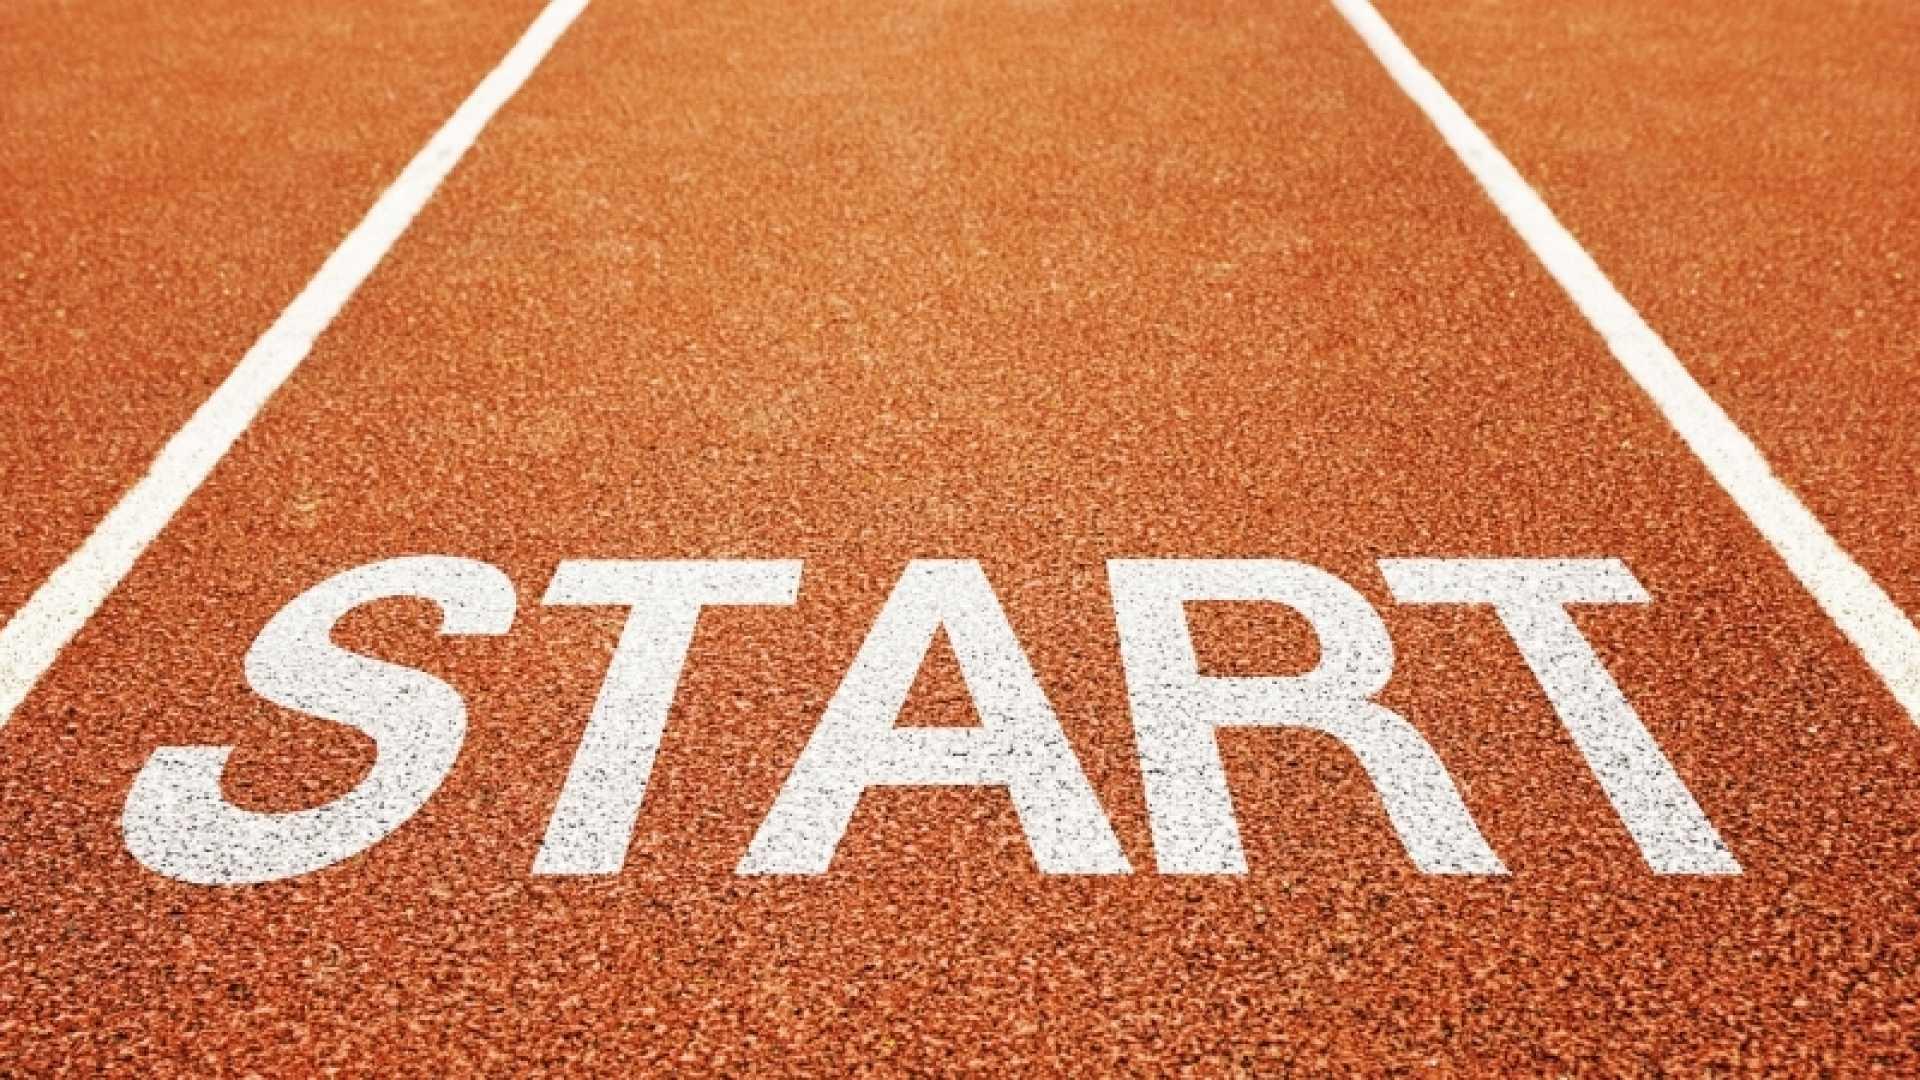 10 Best Ways to Start a Company